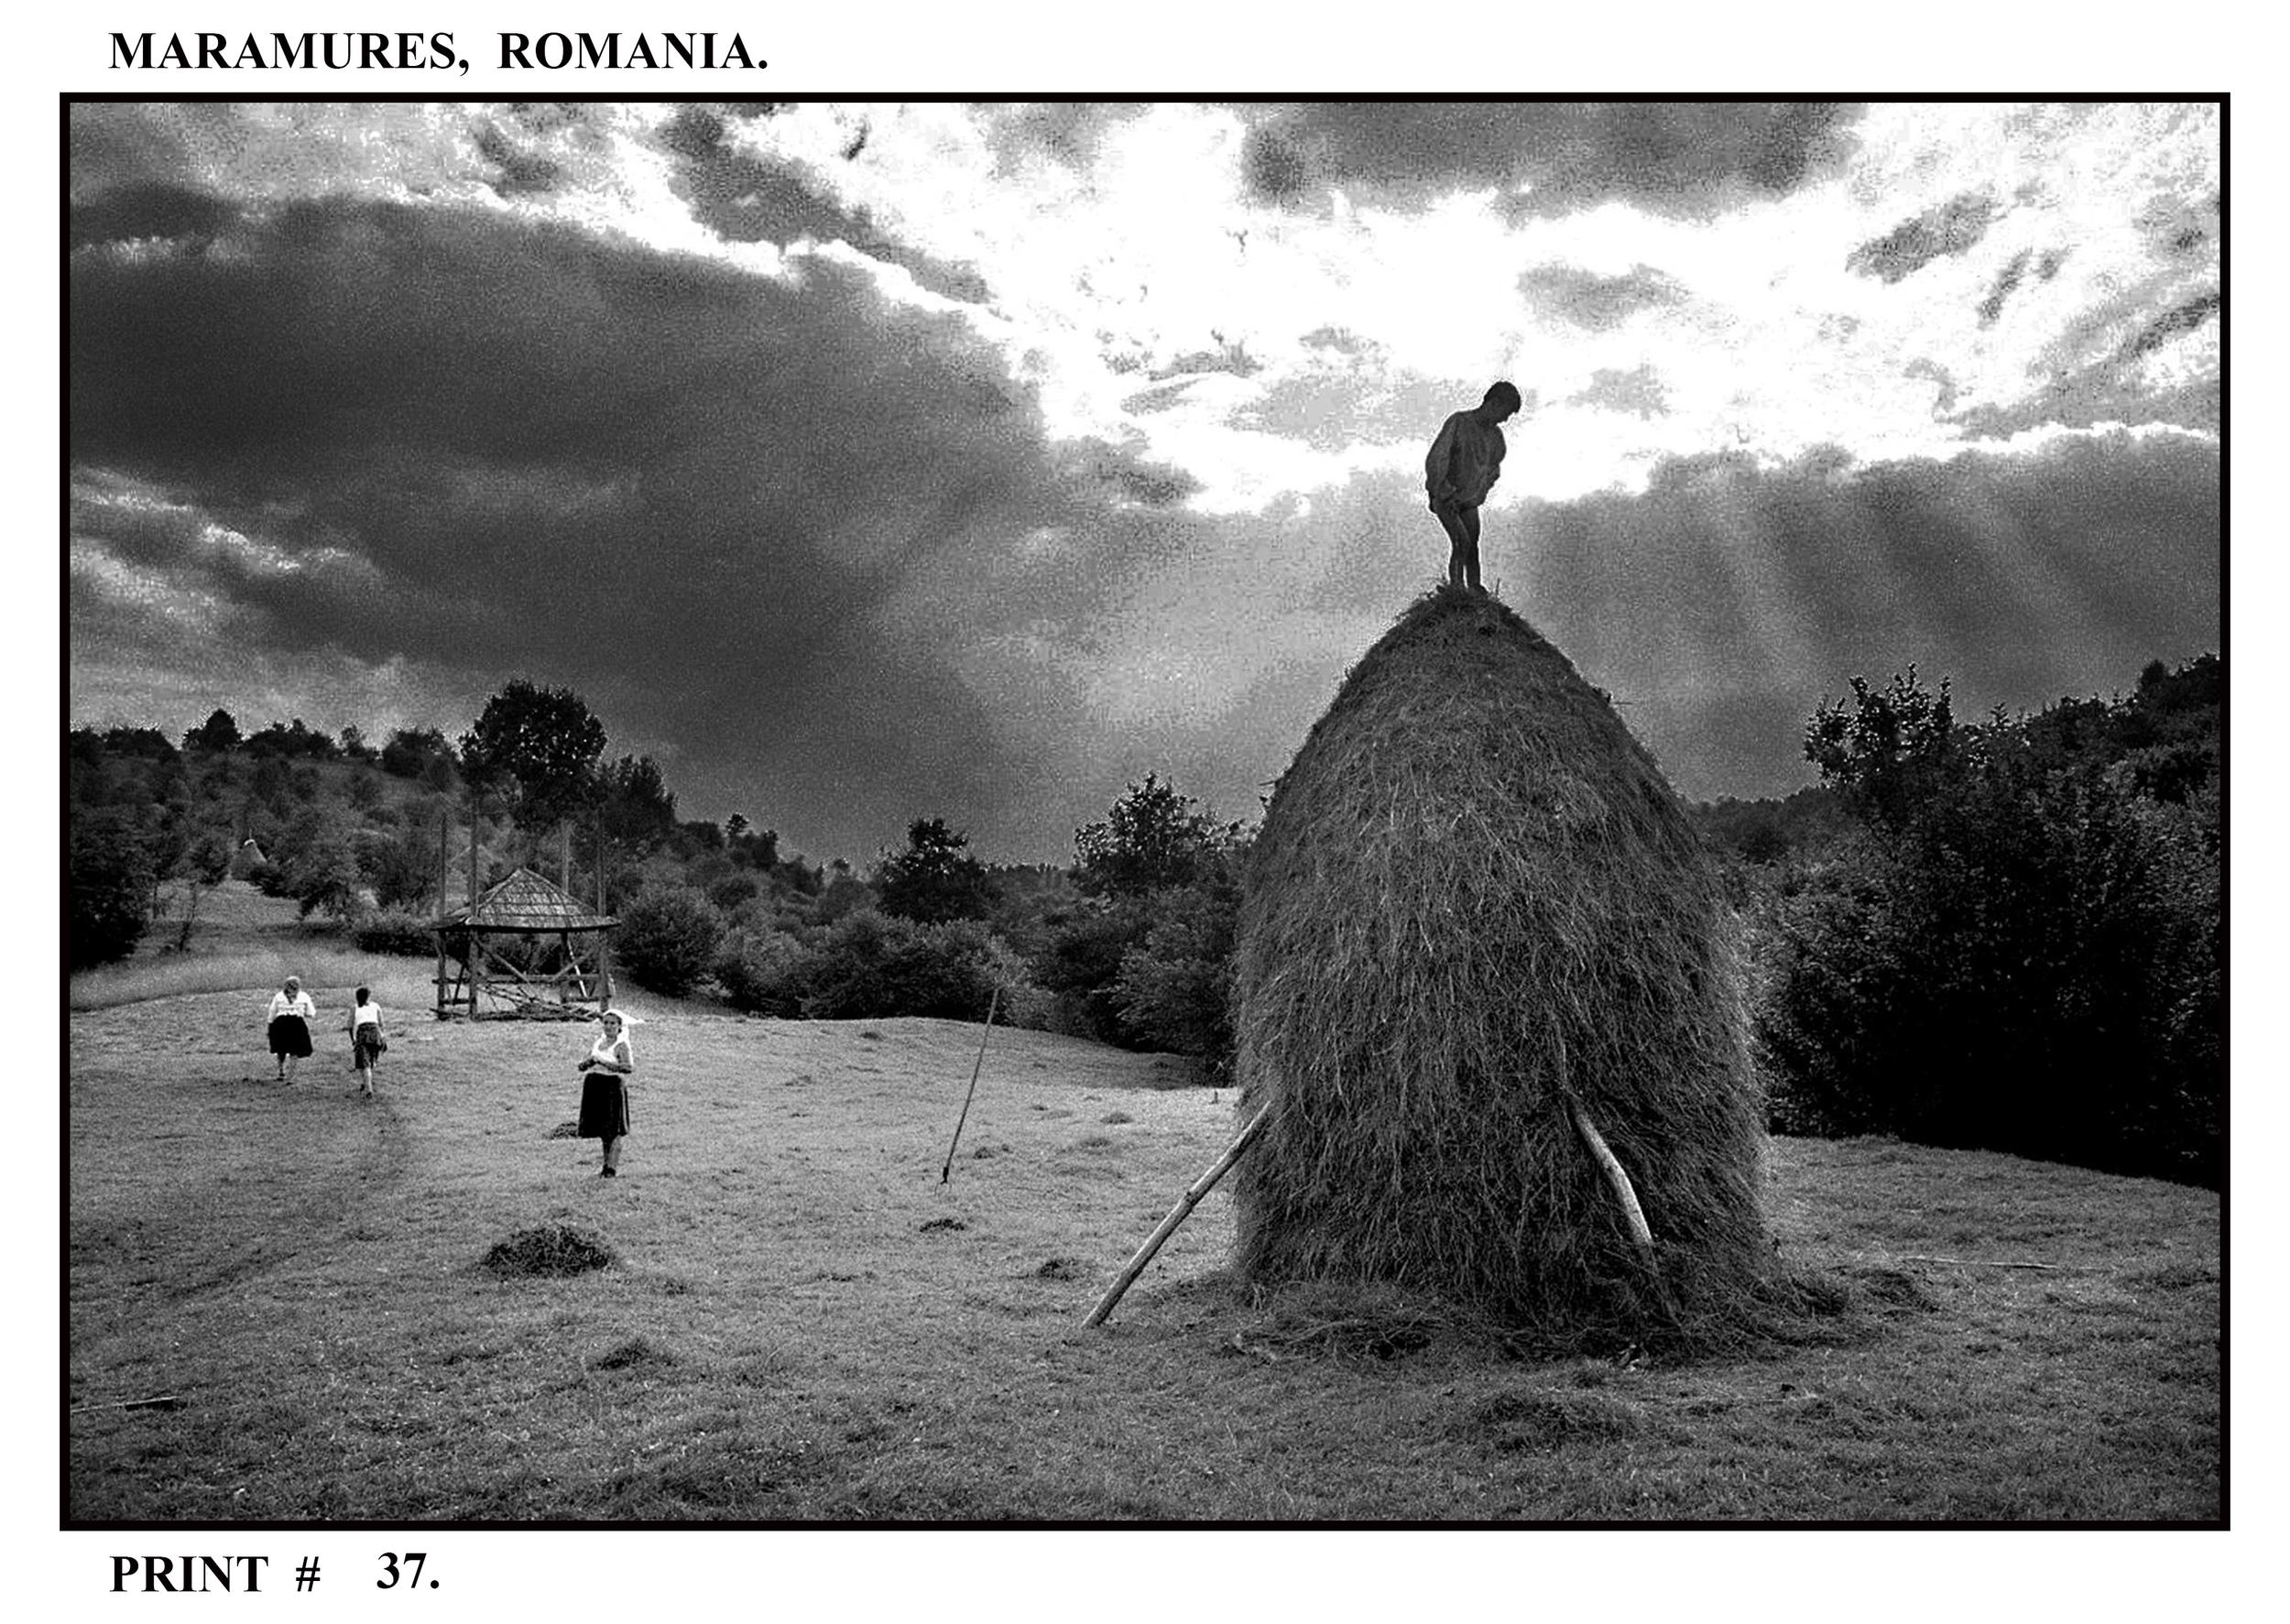 037MARAMURES, ROMANIA copy.jpg